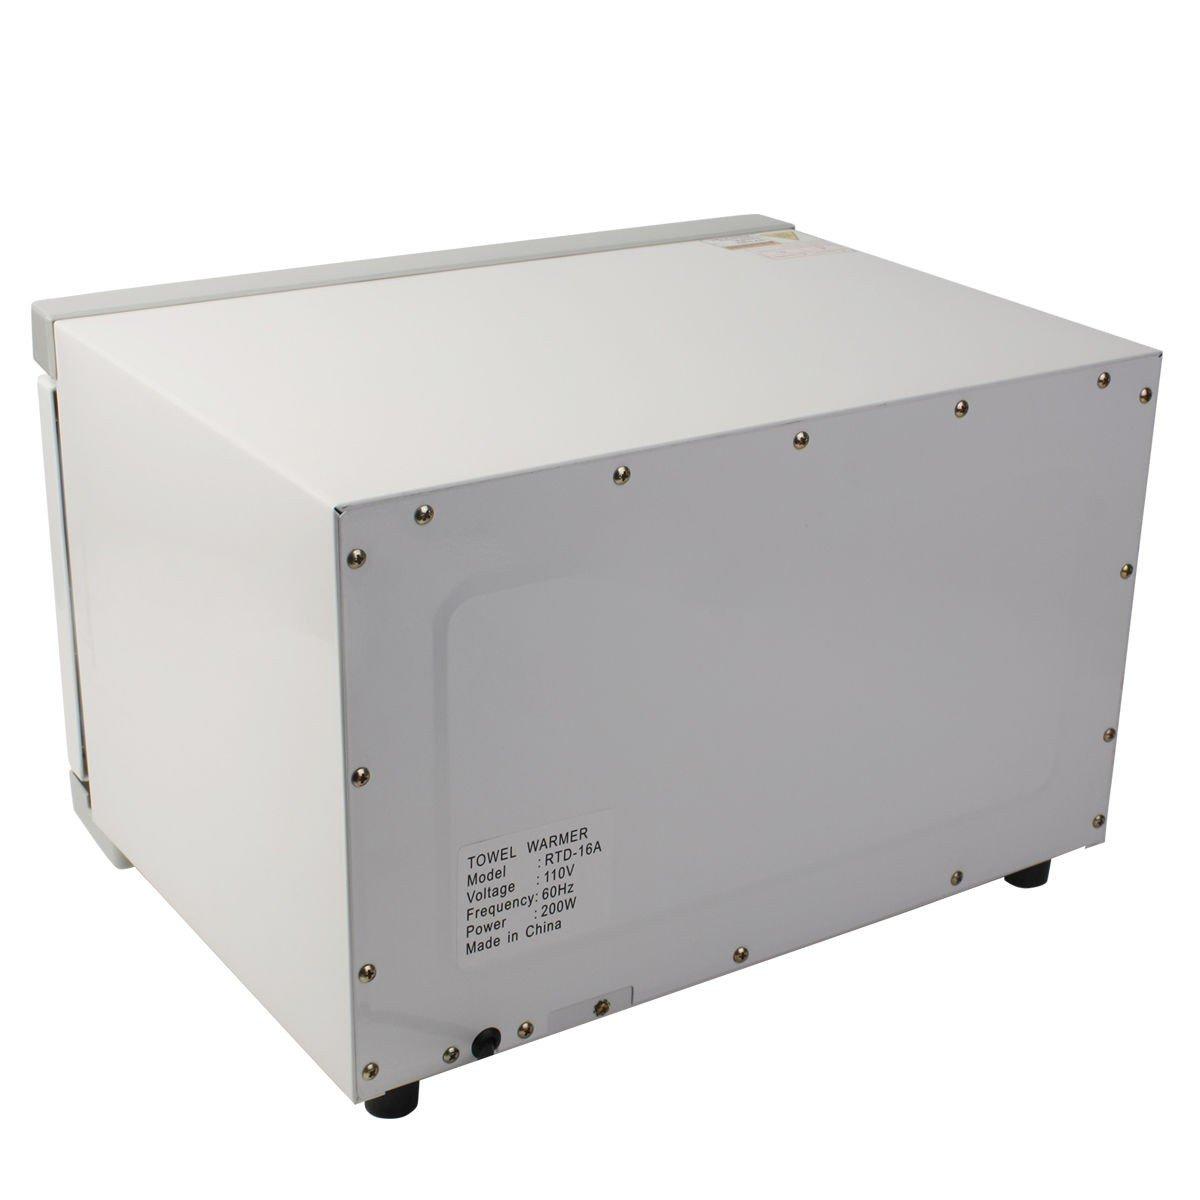 towel warmer cabinet. 2 In 1 Hot Towel Warmer Cabinet 16L Spa Beauty Salon Equipment UV Sterilizer F